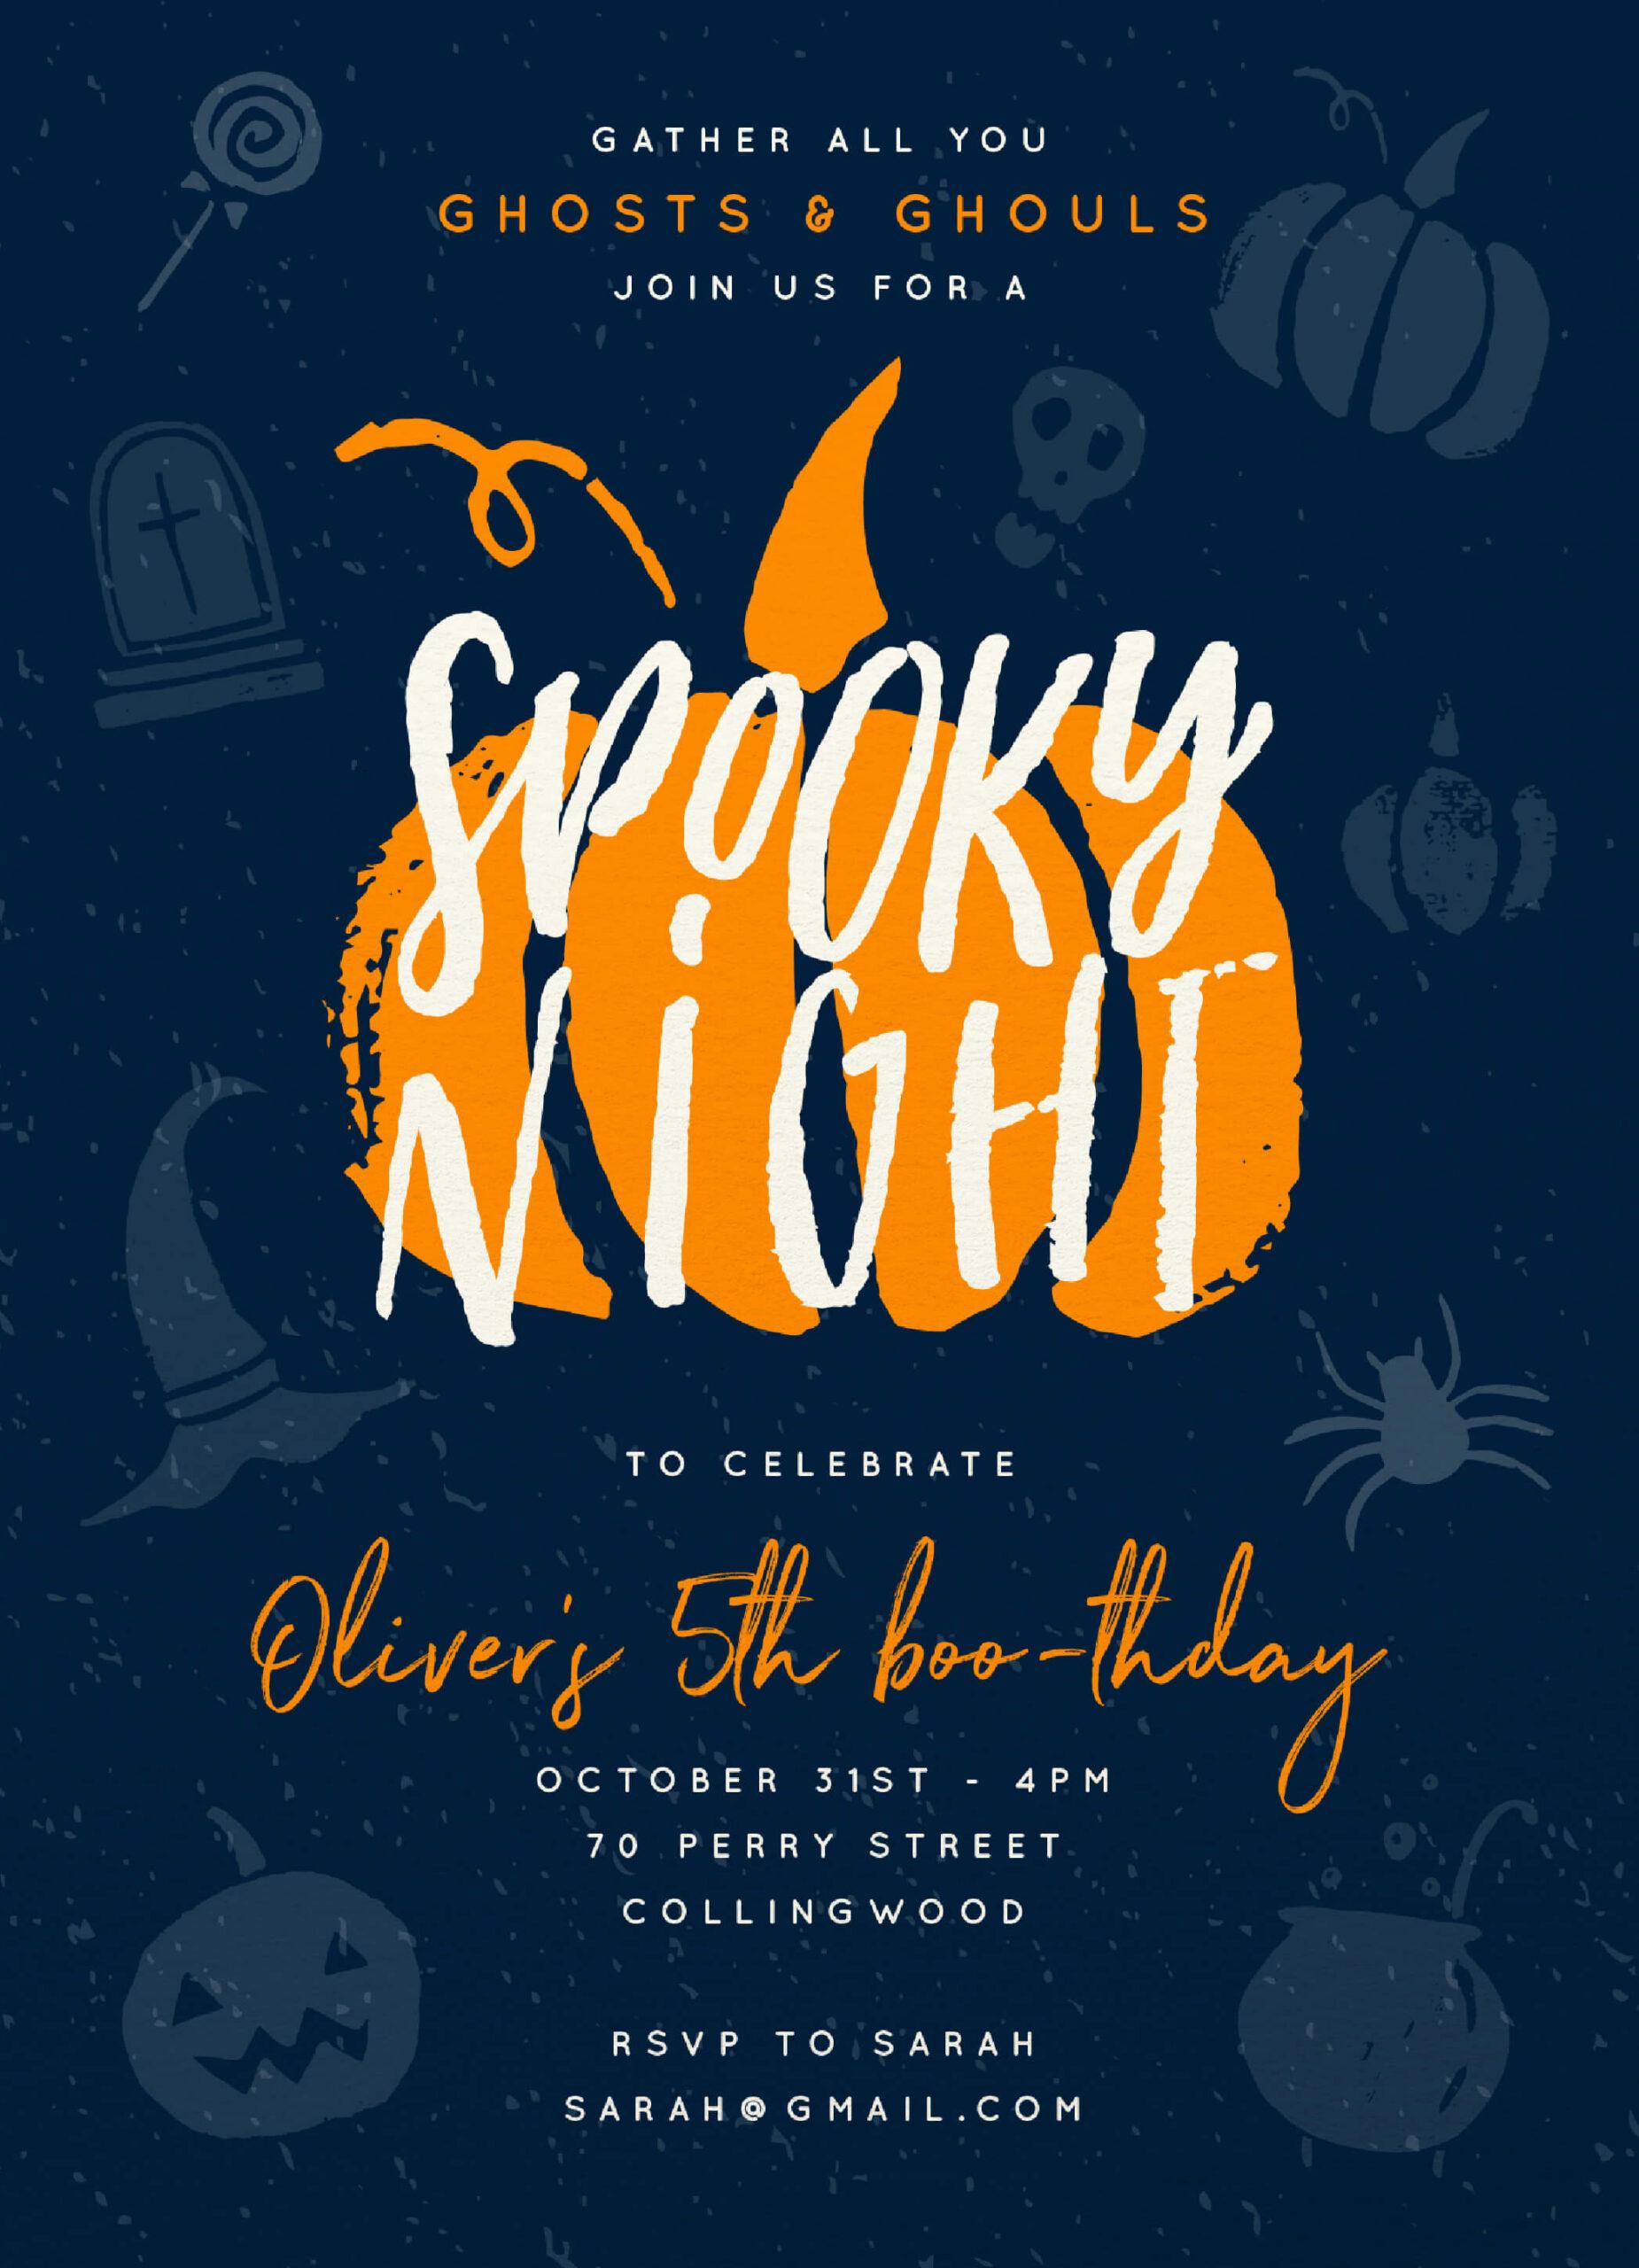 Halloween Birthday Parties - Everything to Know